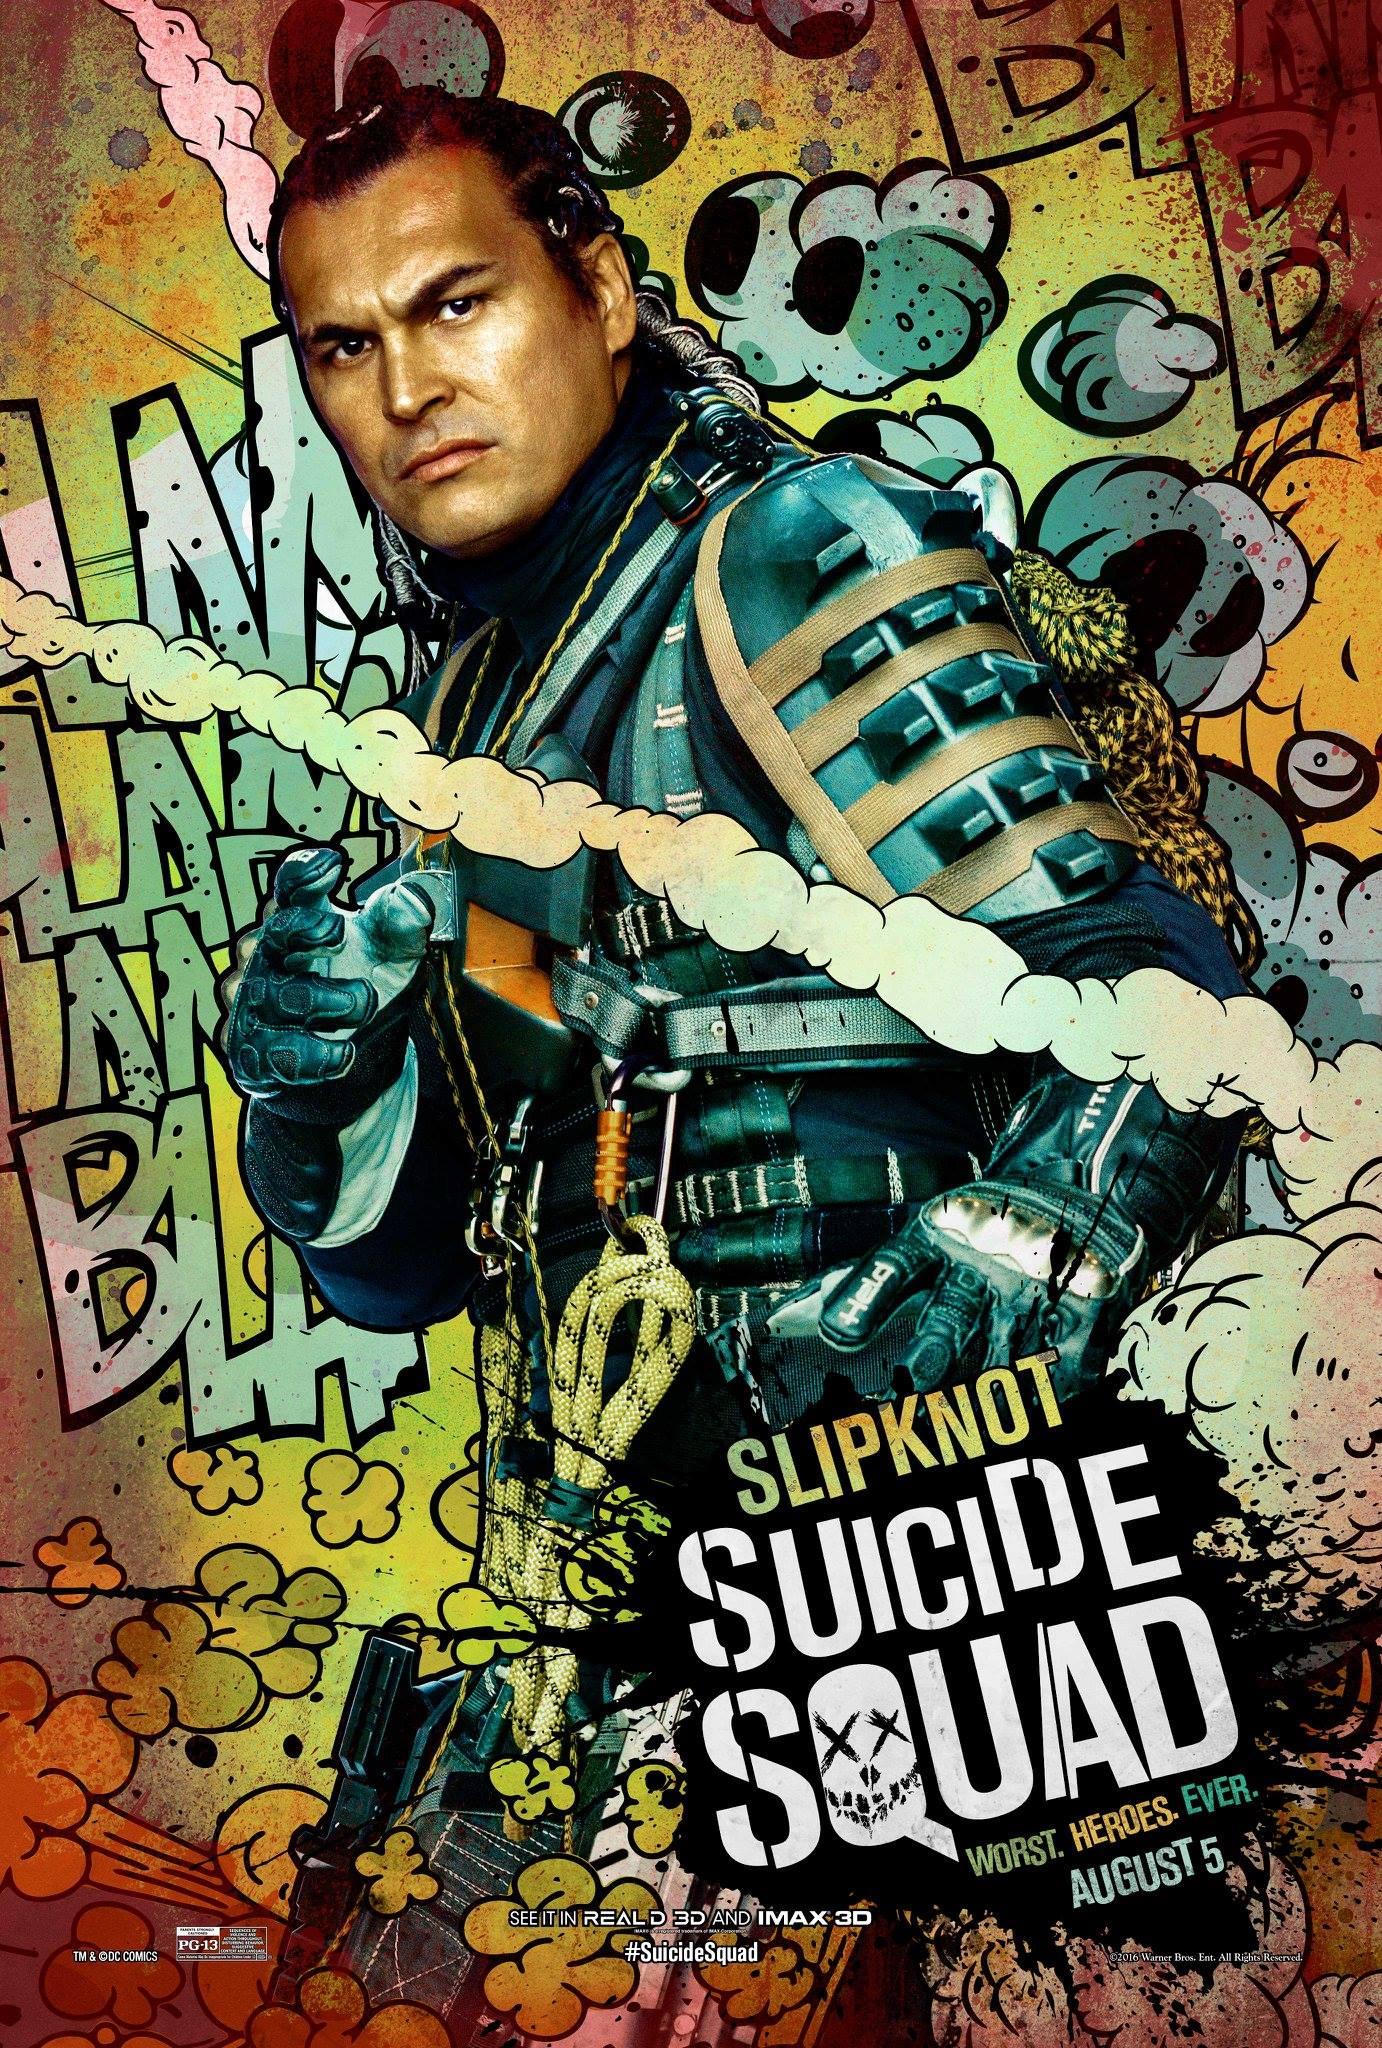 Suicide Squad Slipknot